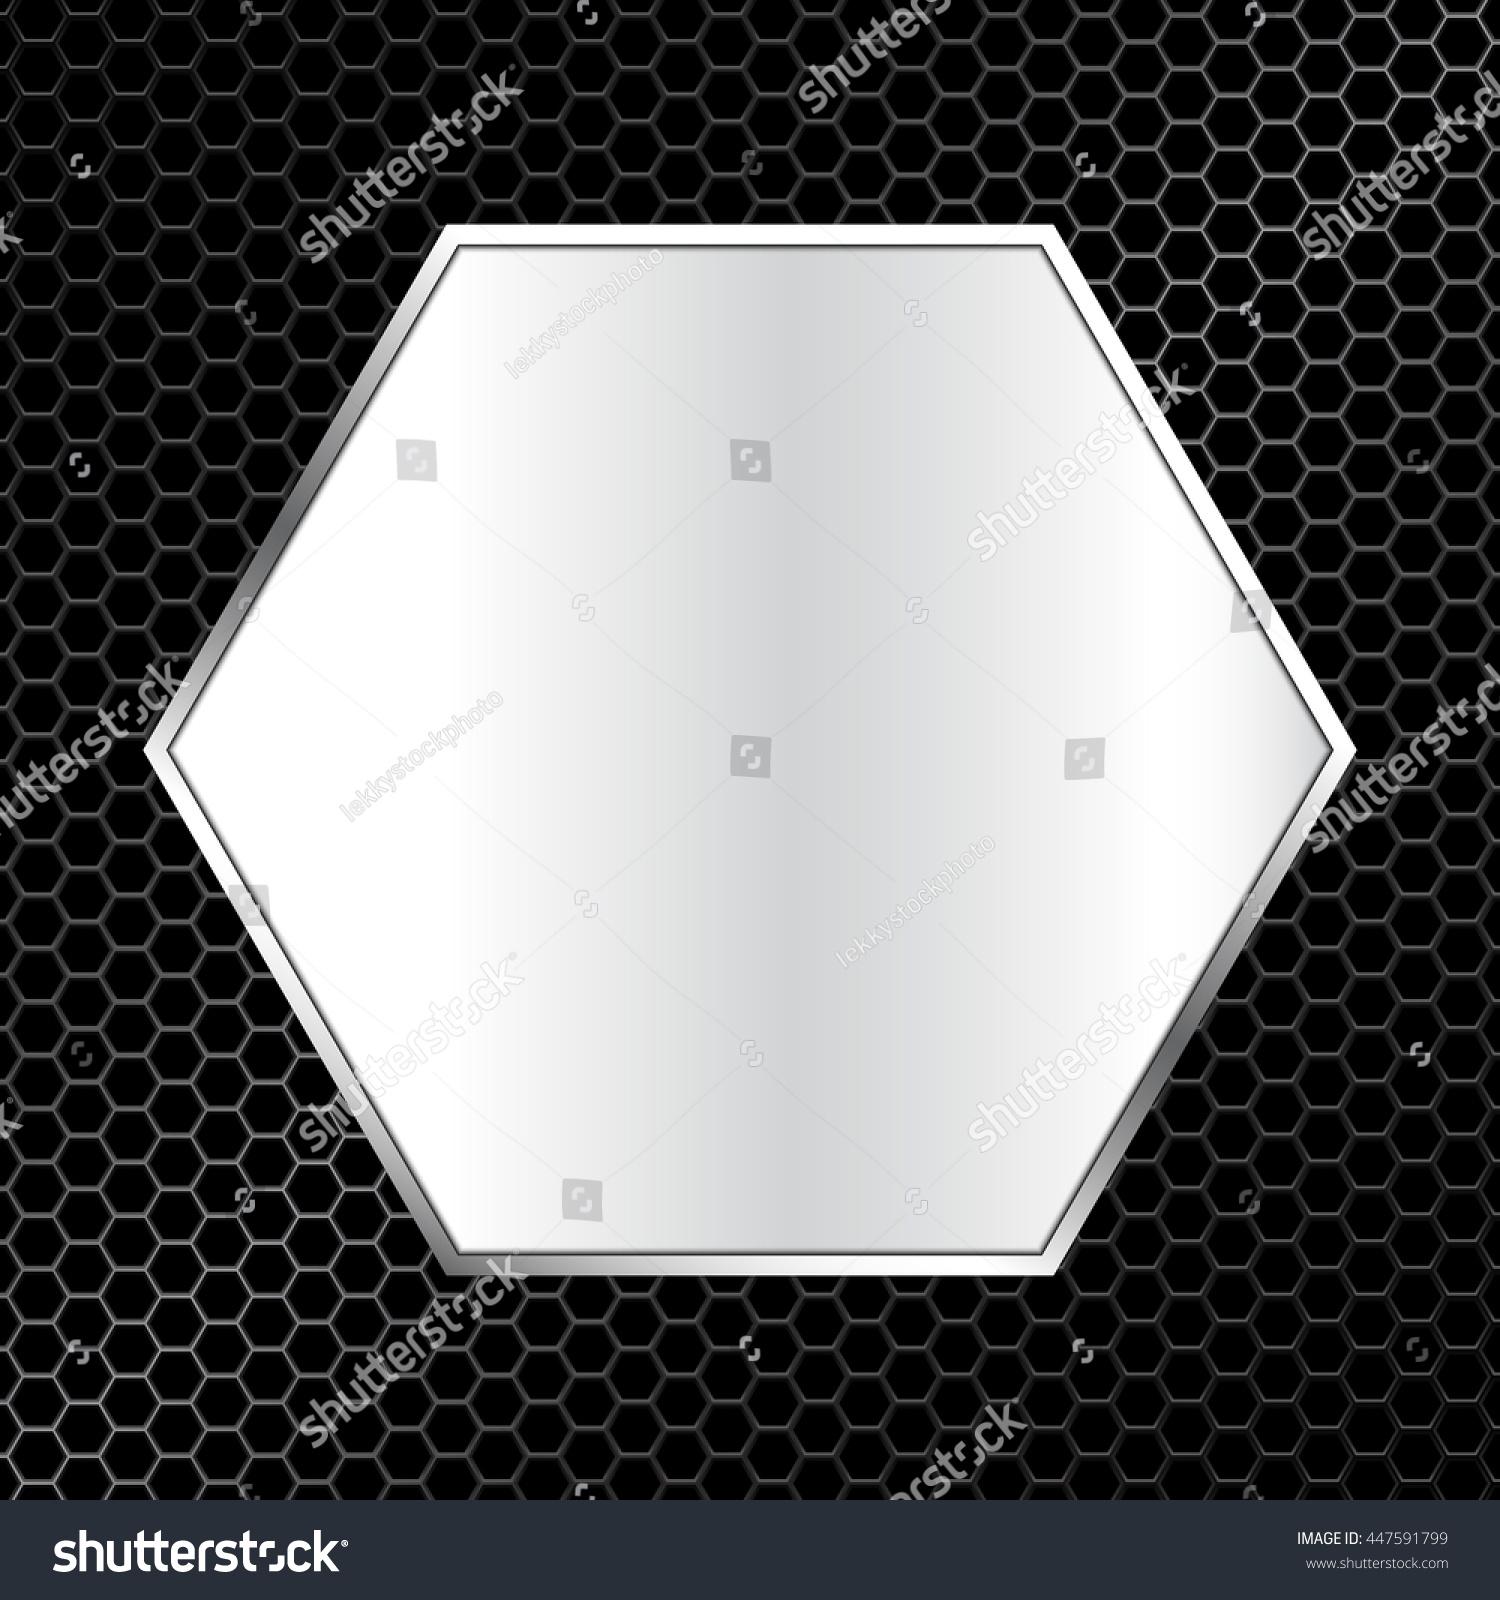 Abstract Metal Texture Background Hexagon Frame Stock Vector ...